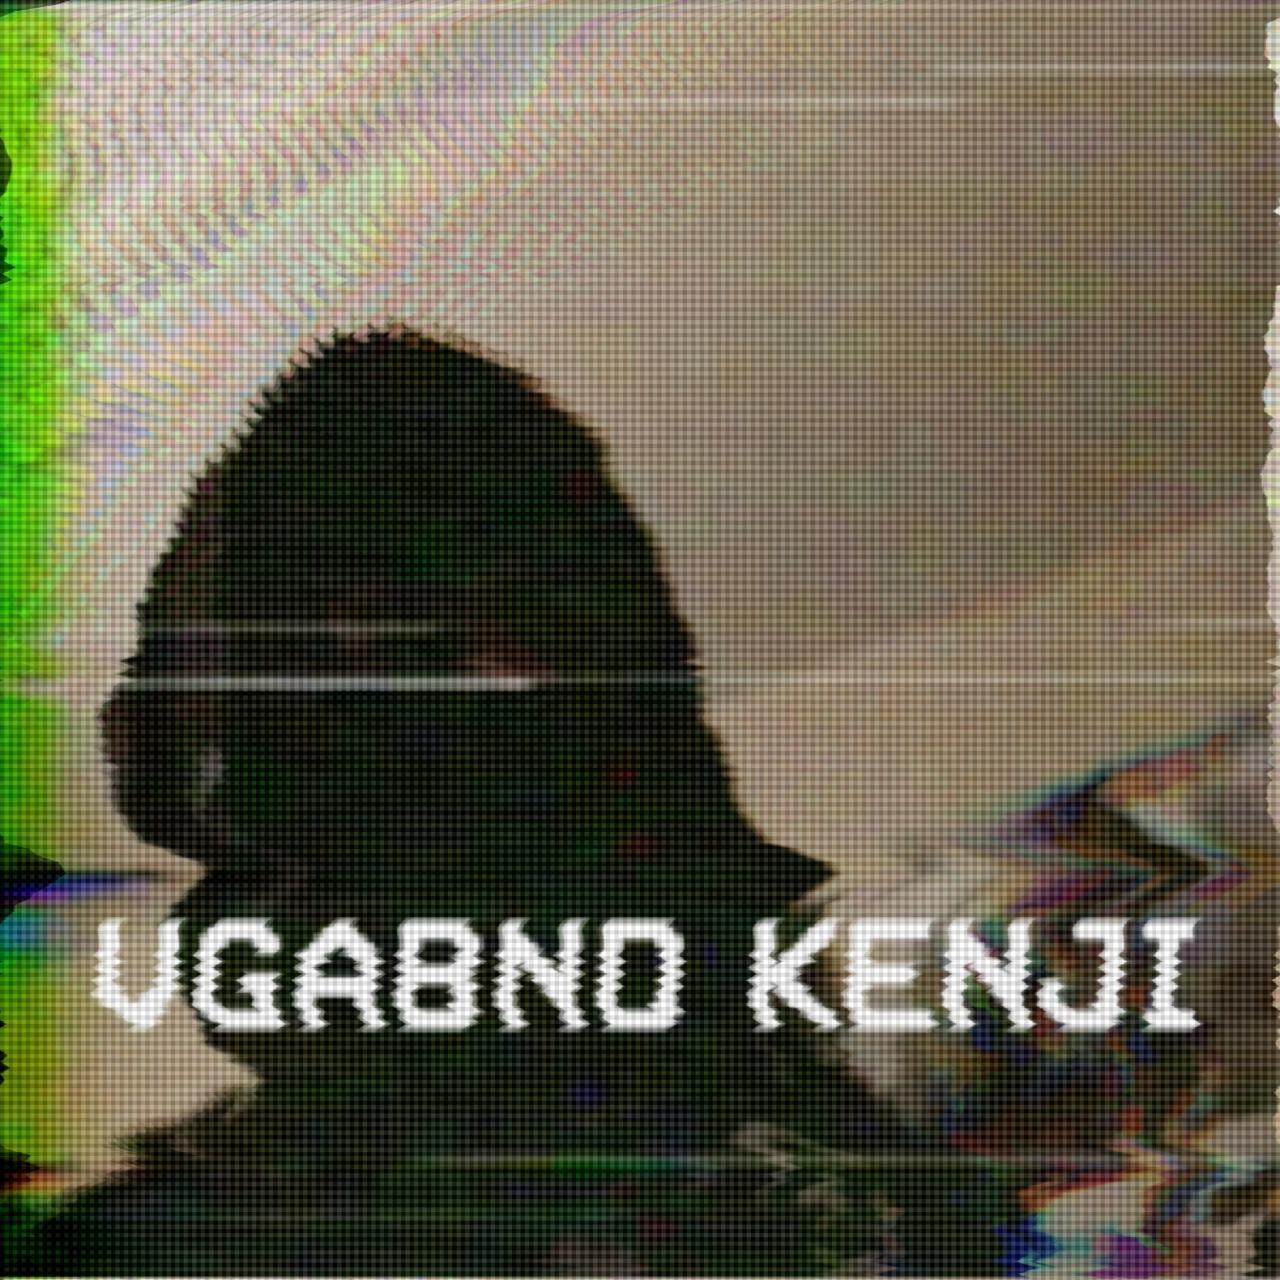 VGABND Kenji